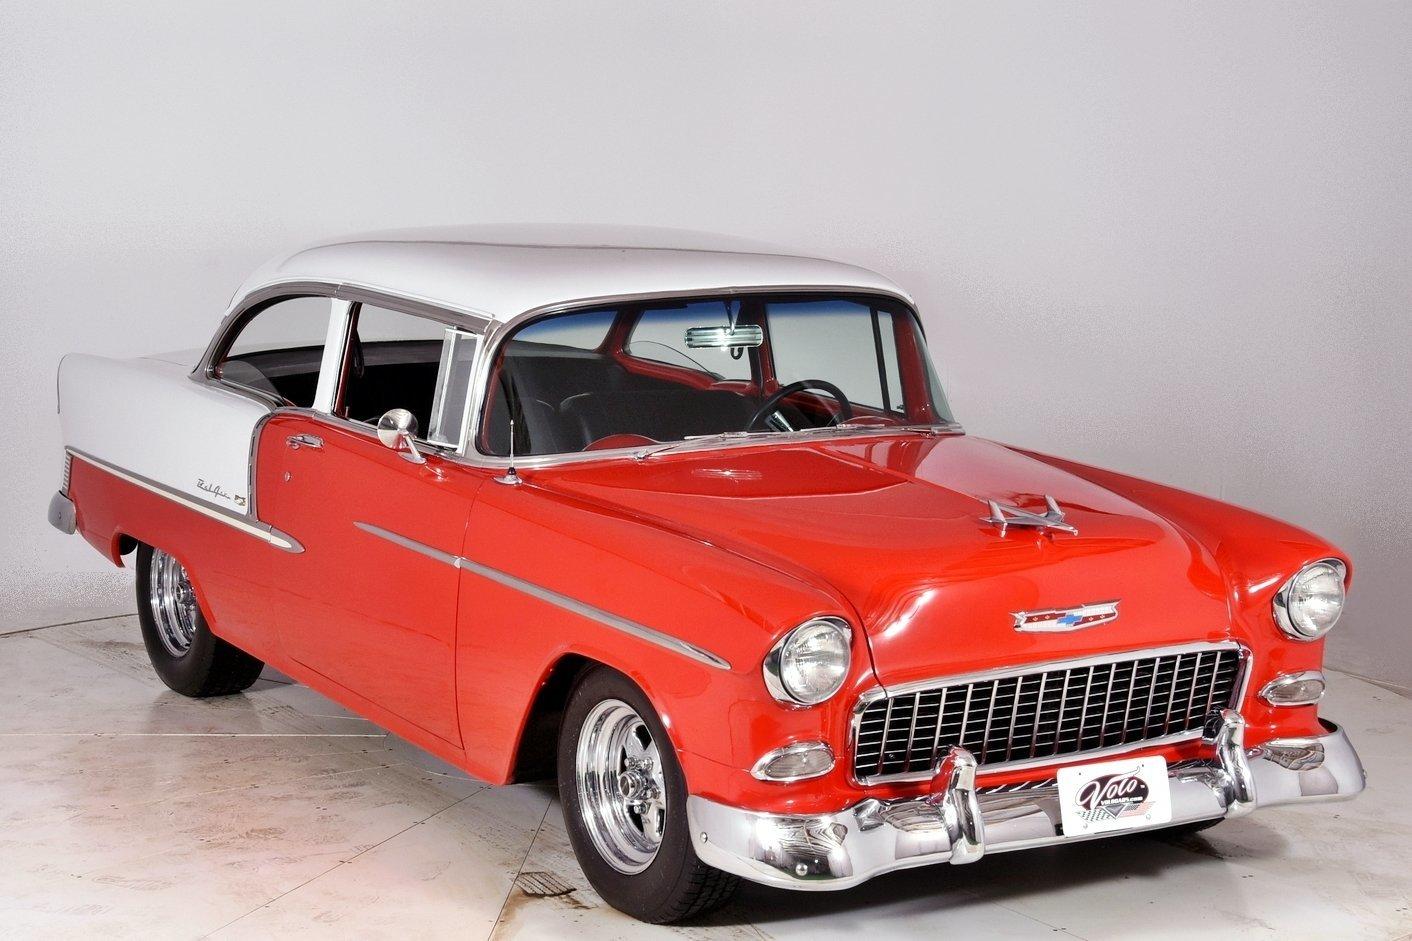 1955 chevrolet bel air for sale 76405 mcg for Garage peugeot bouc bel air